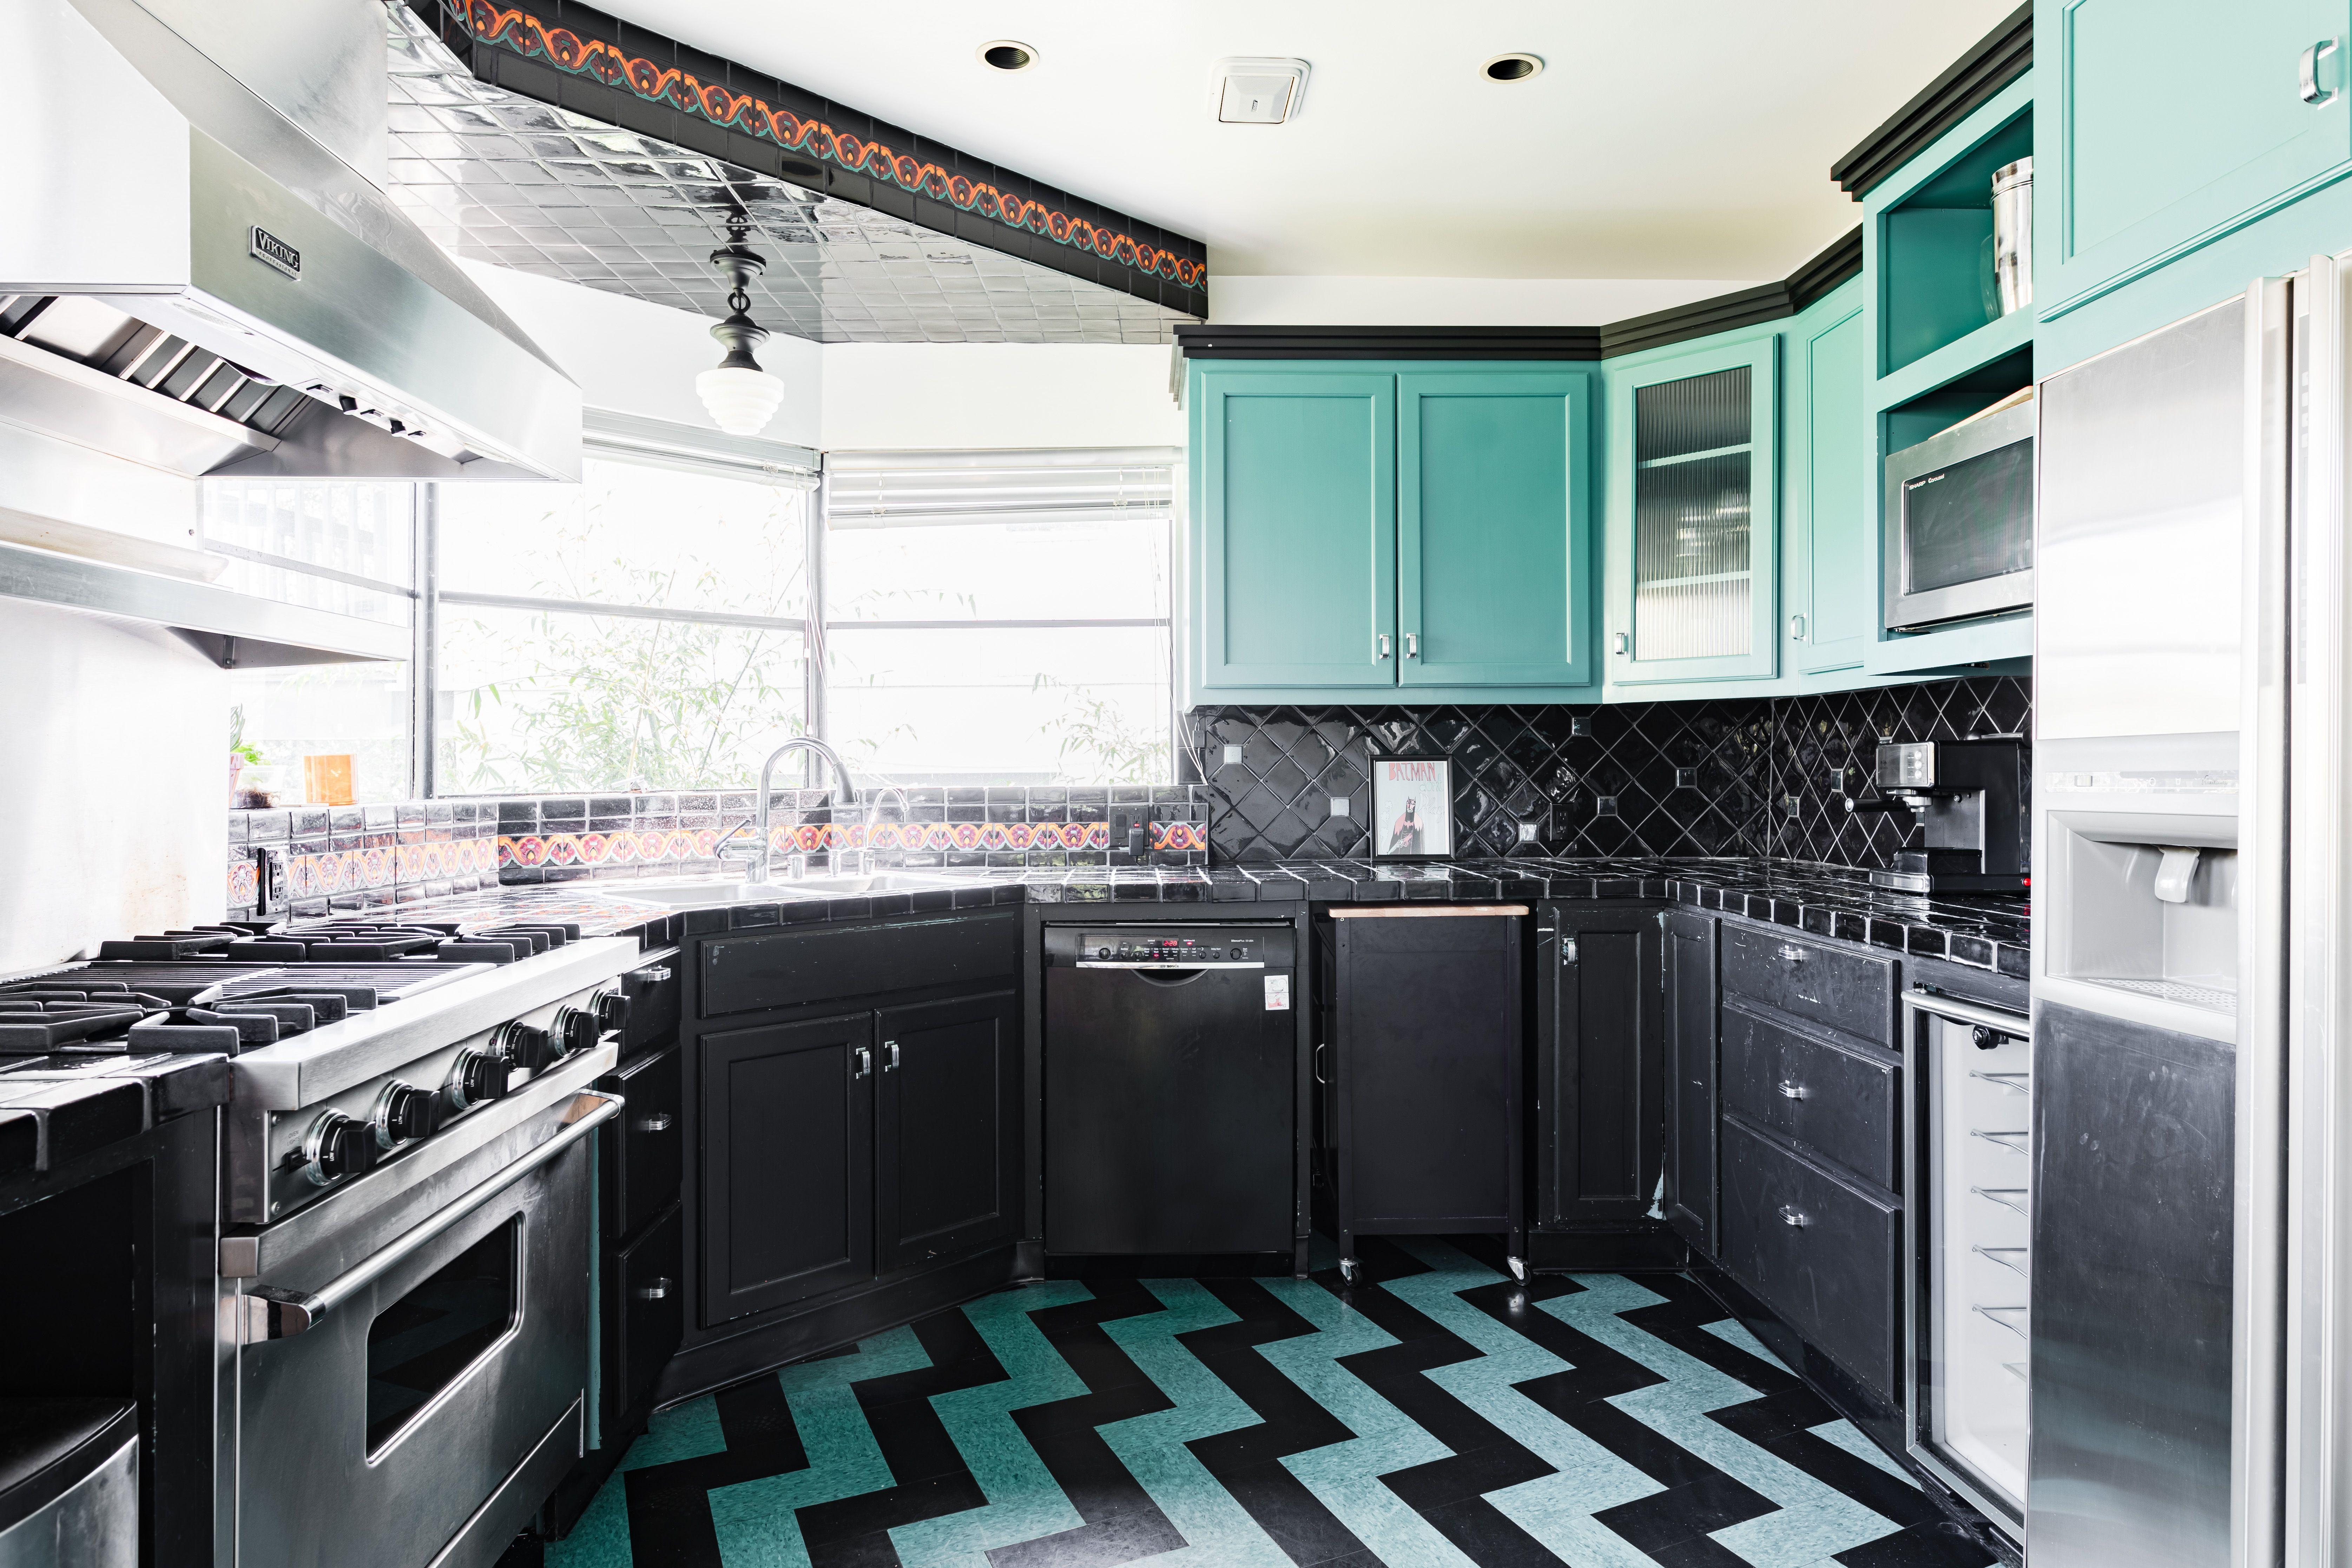 DIY Kitchen Floor Cleaner Tutorial Cleaning Solutions